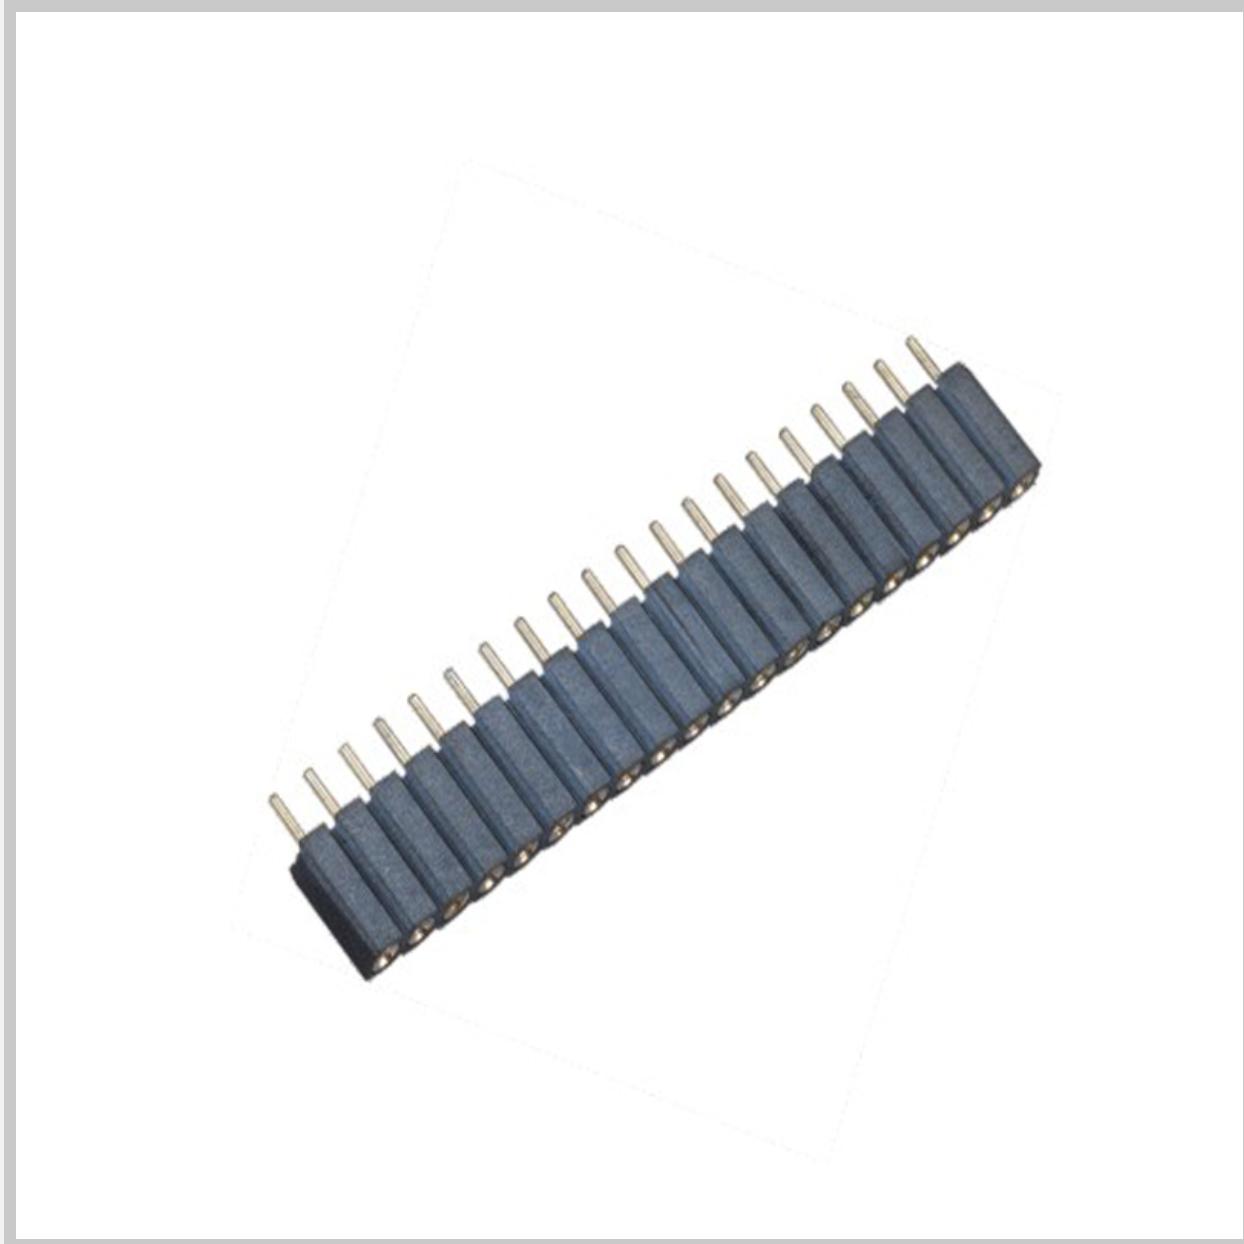 L488XX-97XXX 排母圆孔型-J PH2.0X2.8 单排 卧贴